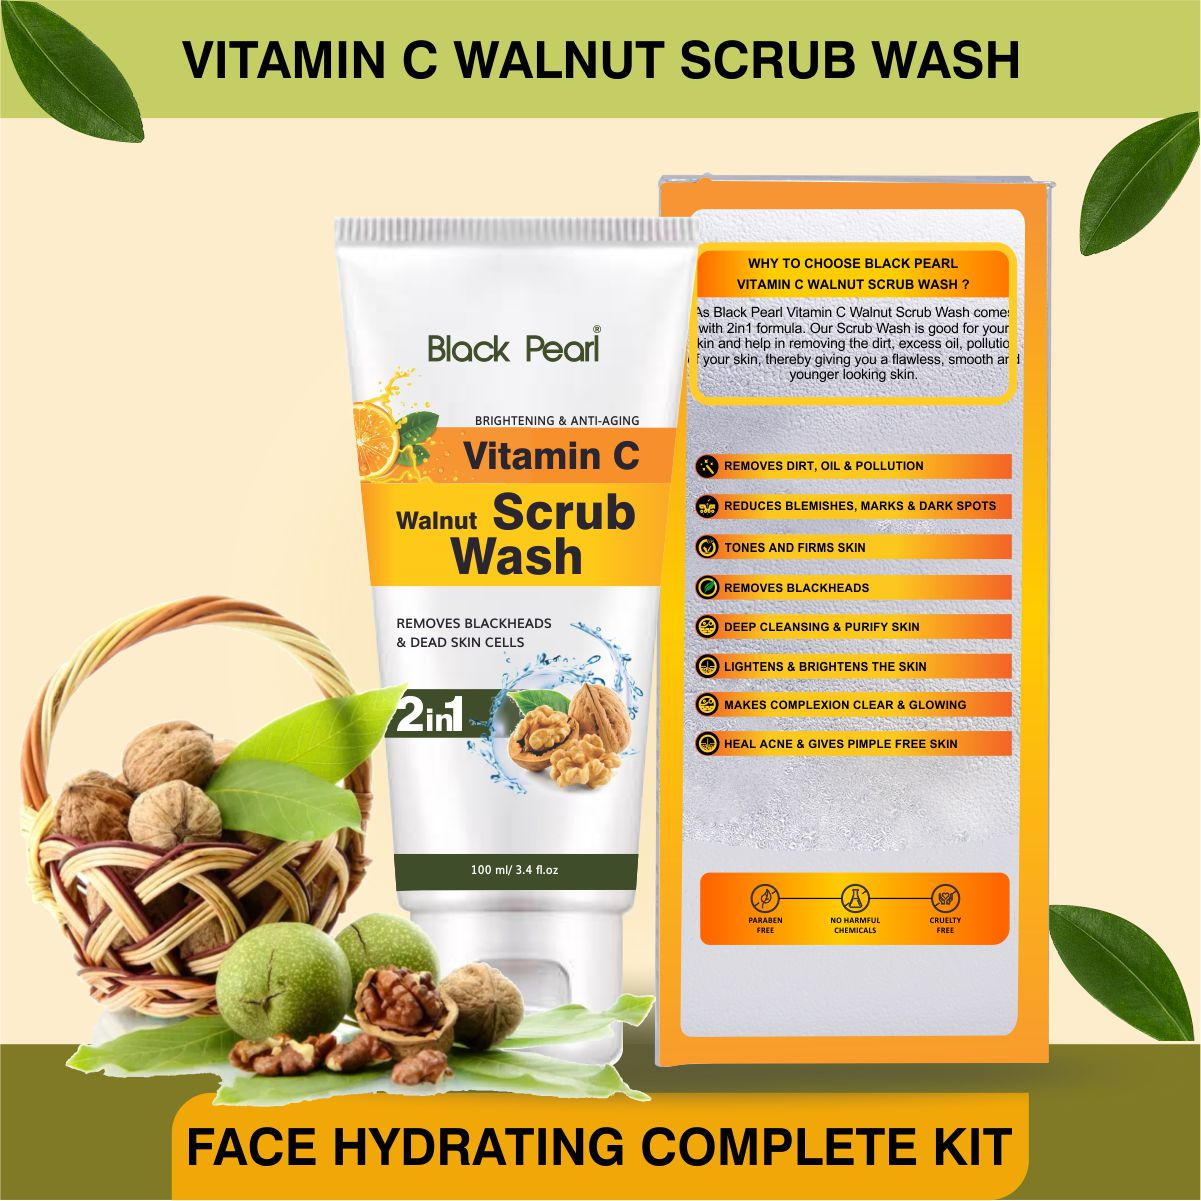 Face Hydrating Complete Kit Vitamin C Walnut Scrub Wash